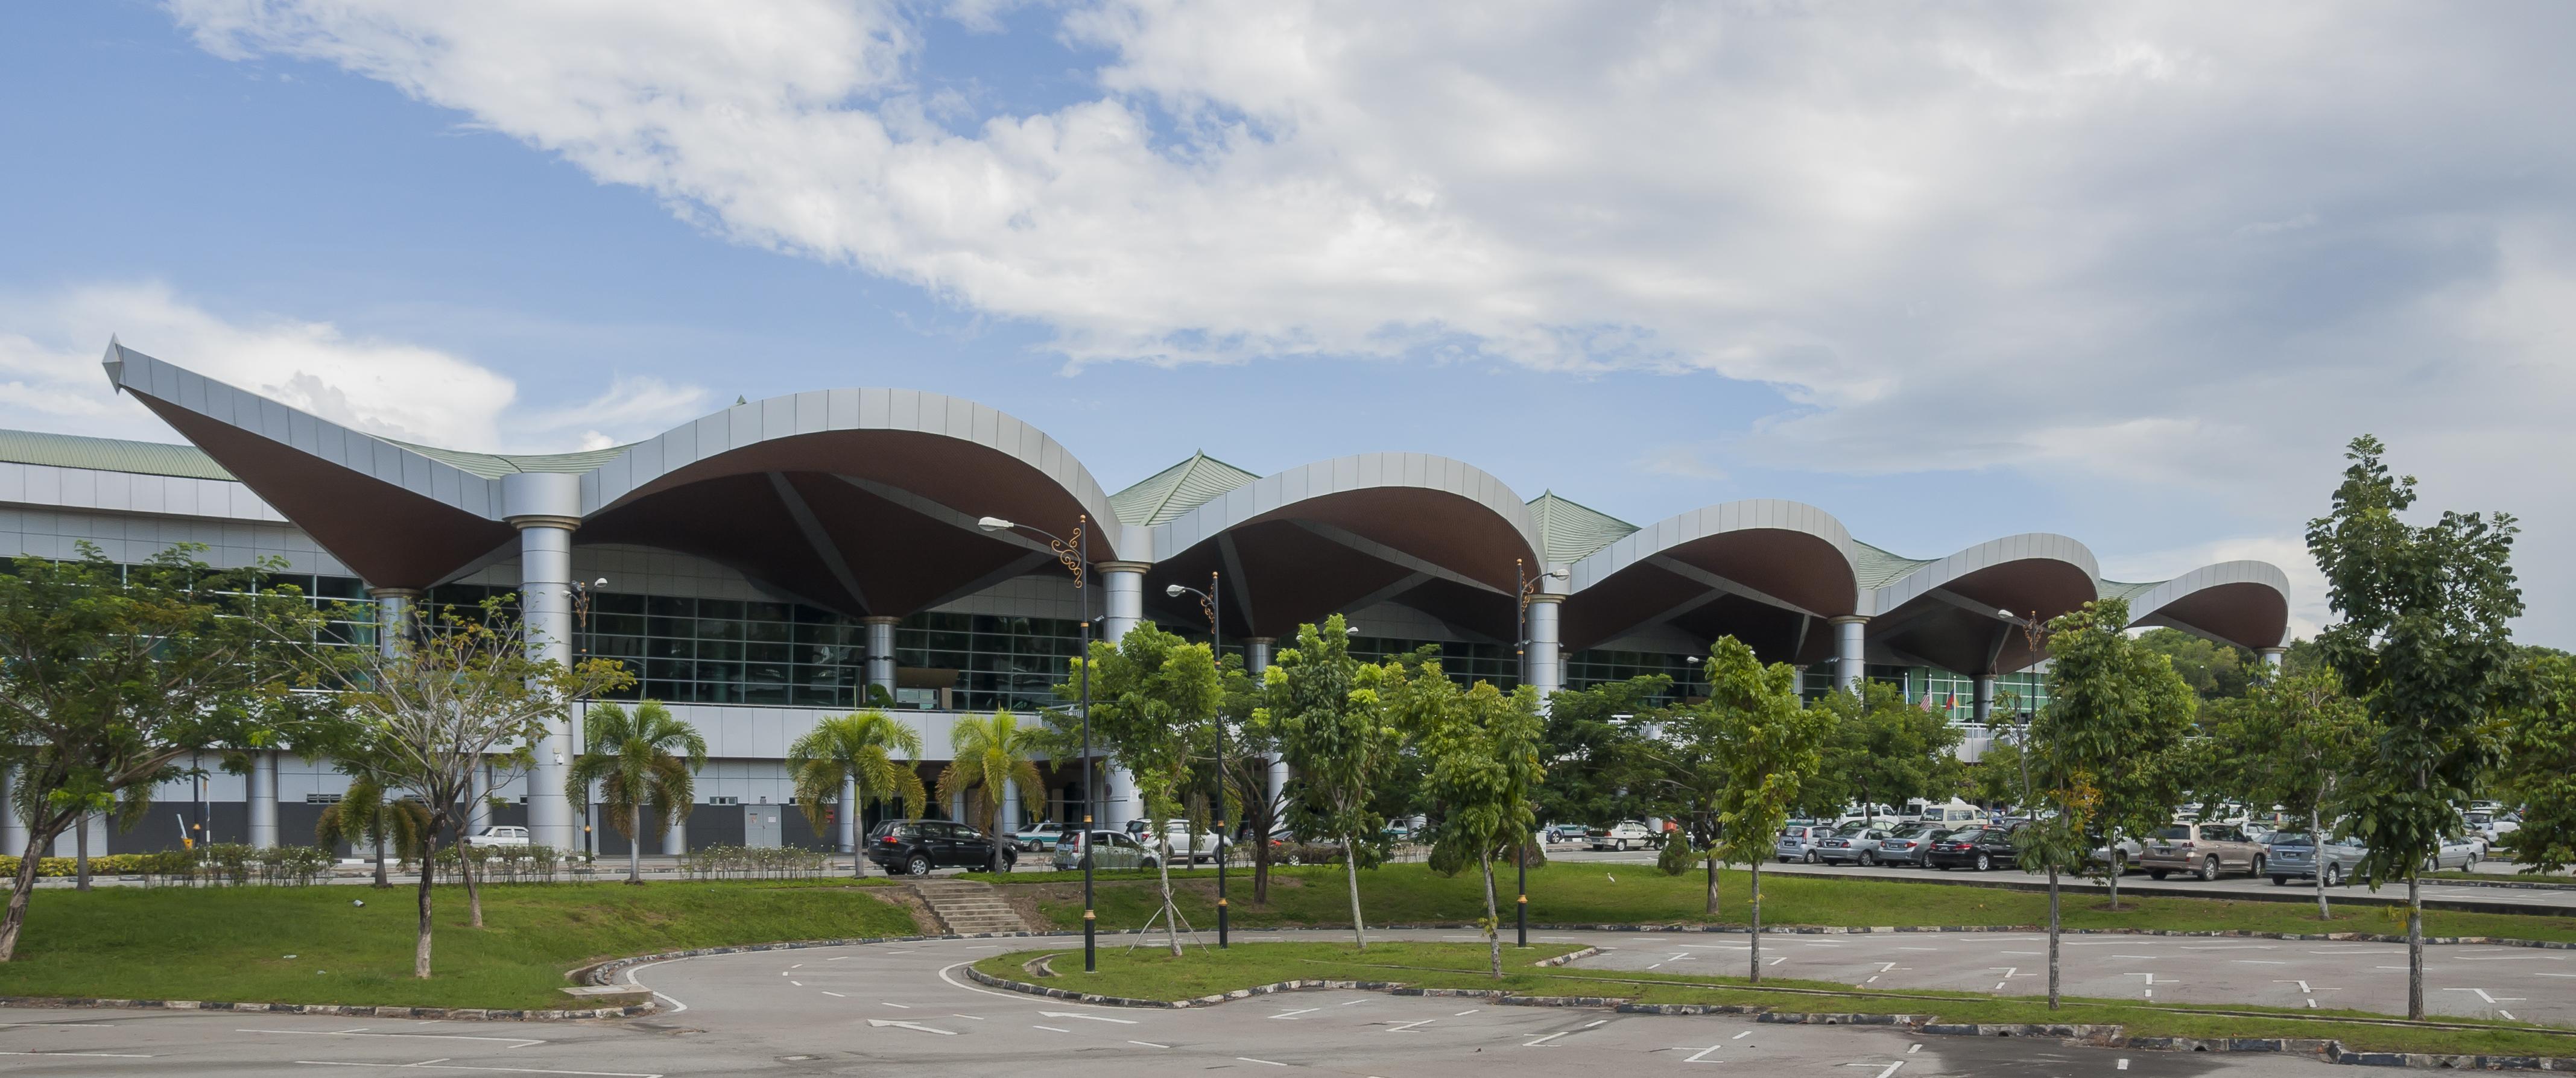 Malaysia Wikipedia Download Lengkap